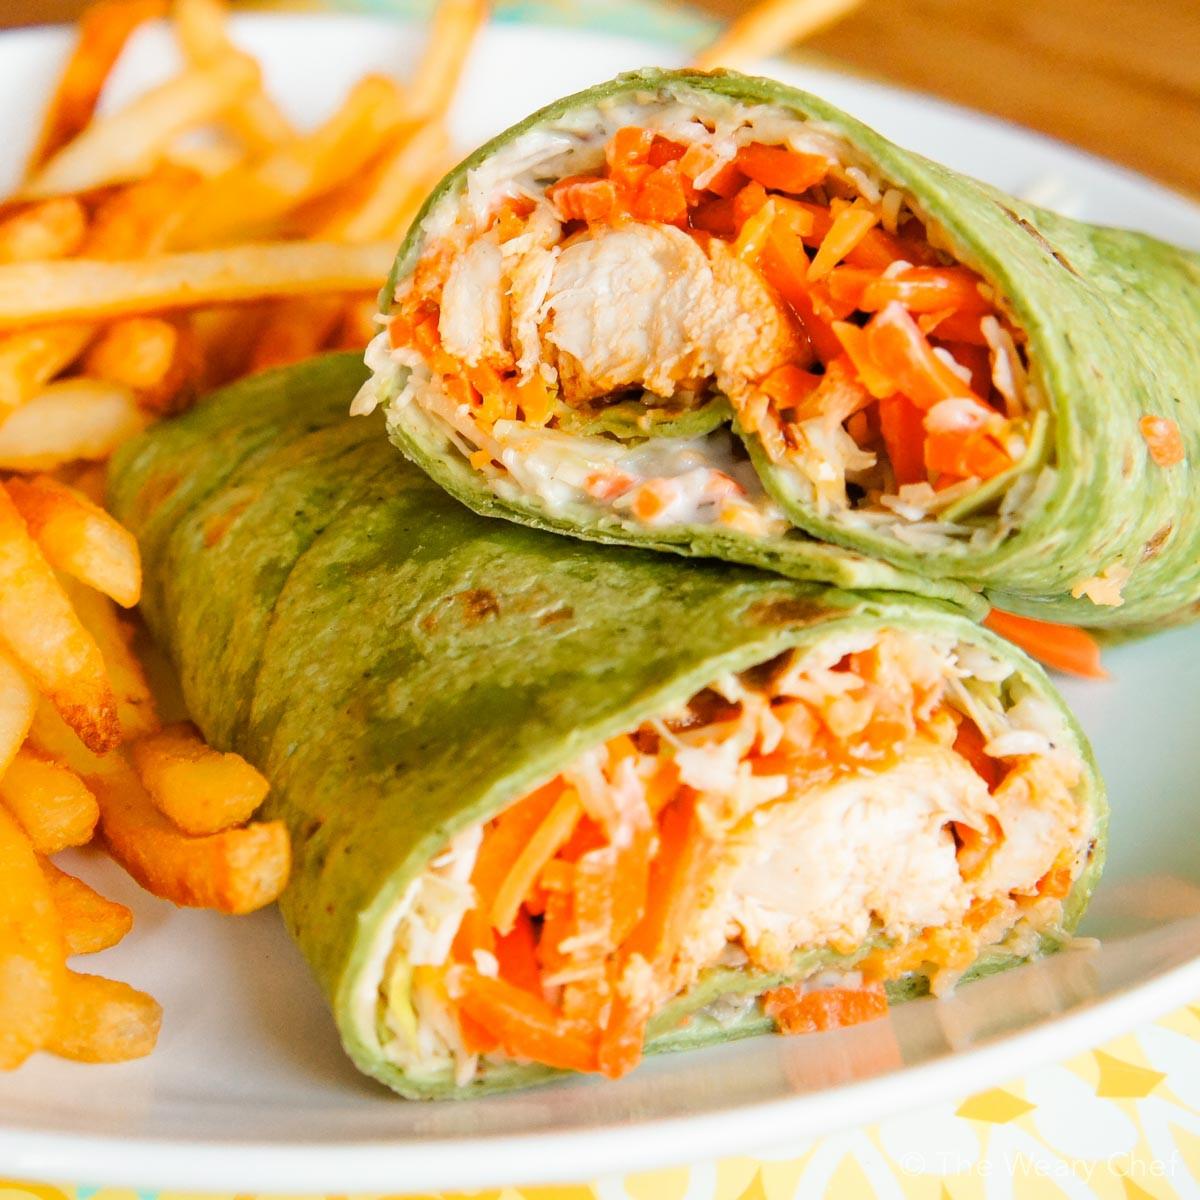 Tasty Dinner Recipes  Buffalo Chicken Wraps A fun and tasty dinner idea The